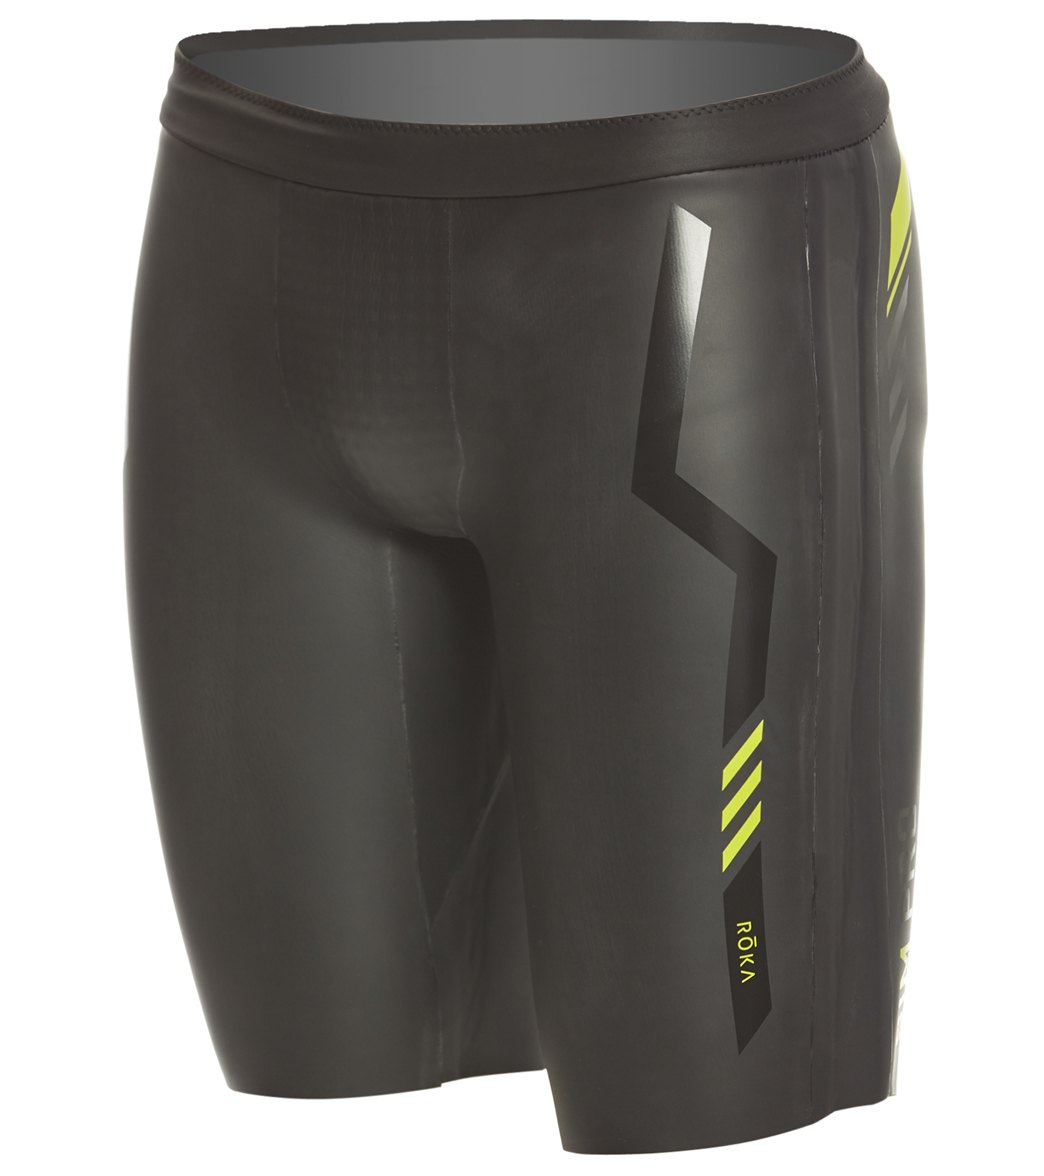 4769b1c8ec ROKA Men's SIM Pro II Neoprene Shorts at SwimOutlet.com - Free Shipping